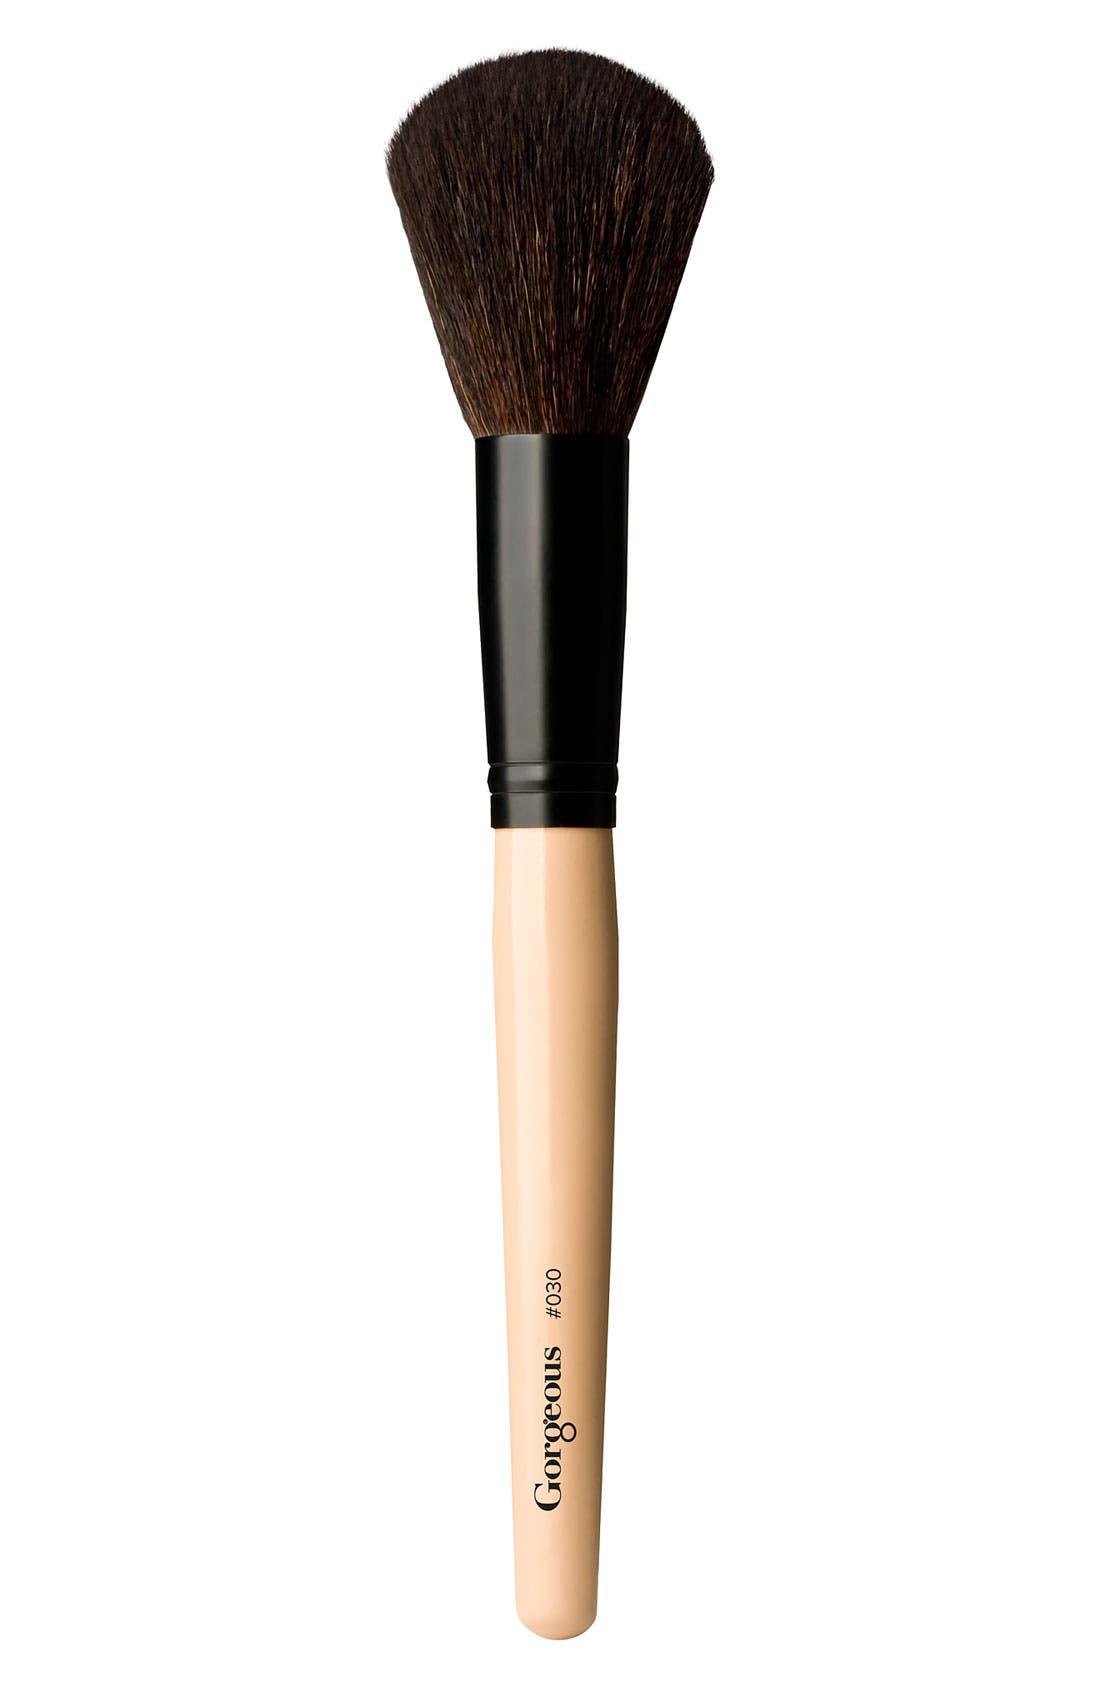 '030' Large Powder Brush,                         Main,                         color, NO COLOR